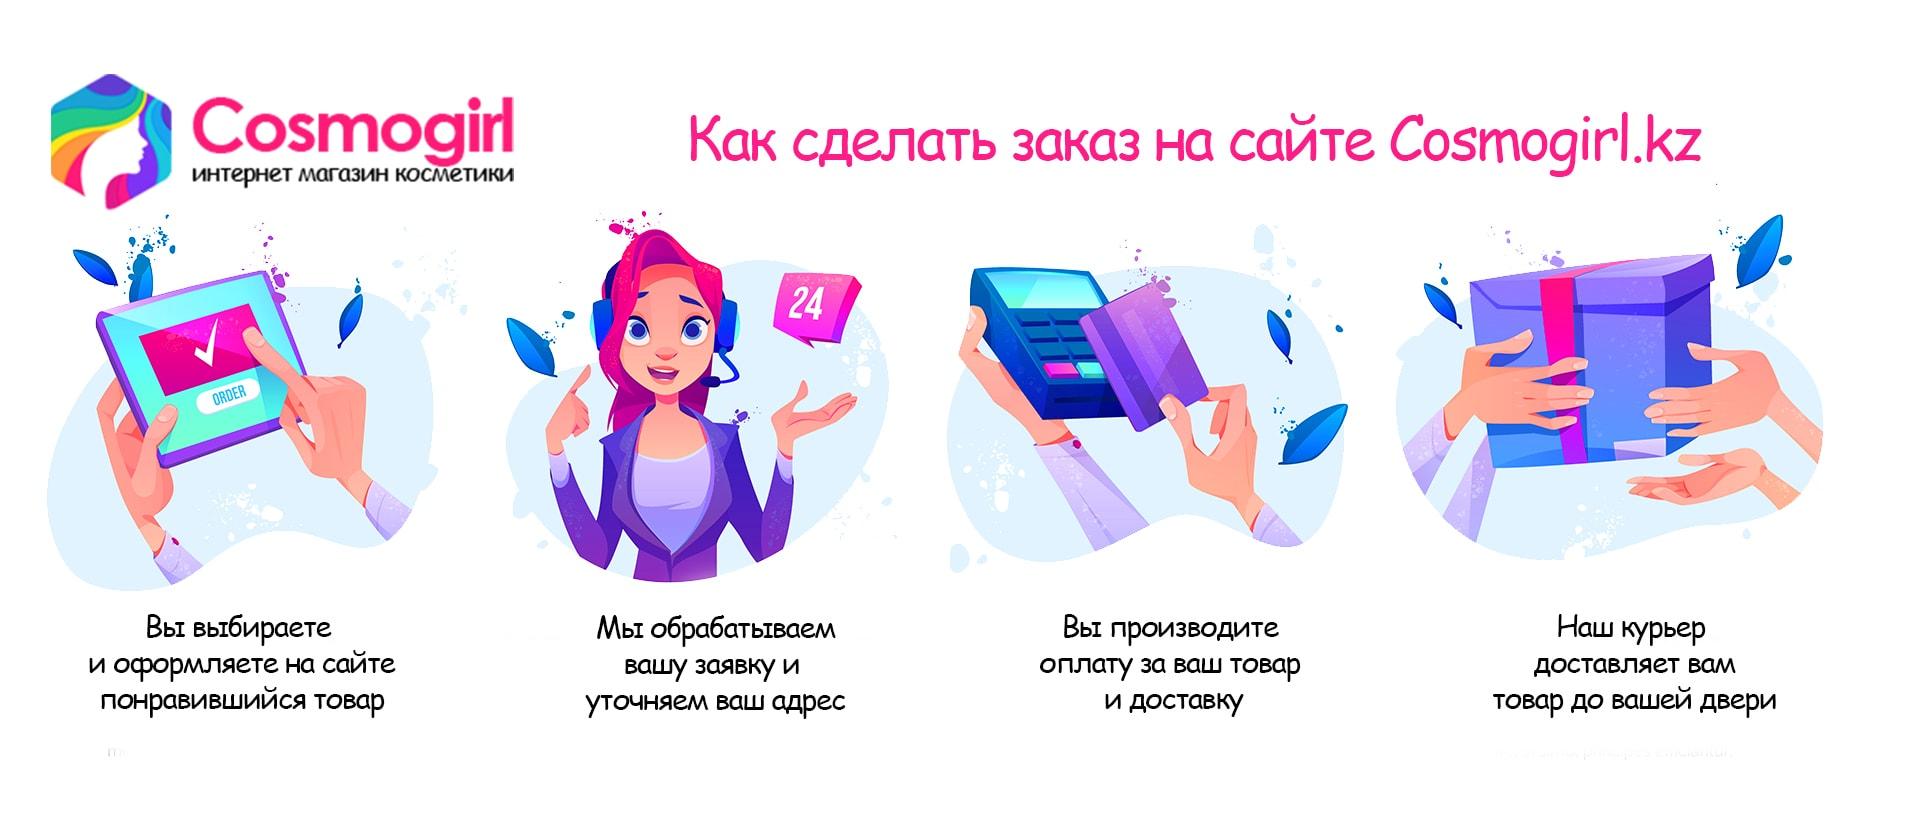 Магазин косметики Cosmogirl.kz